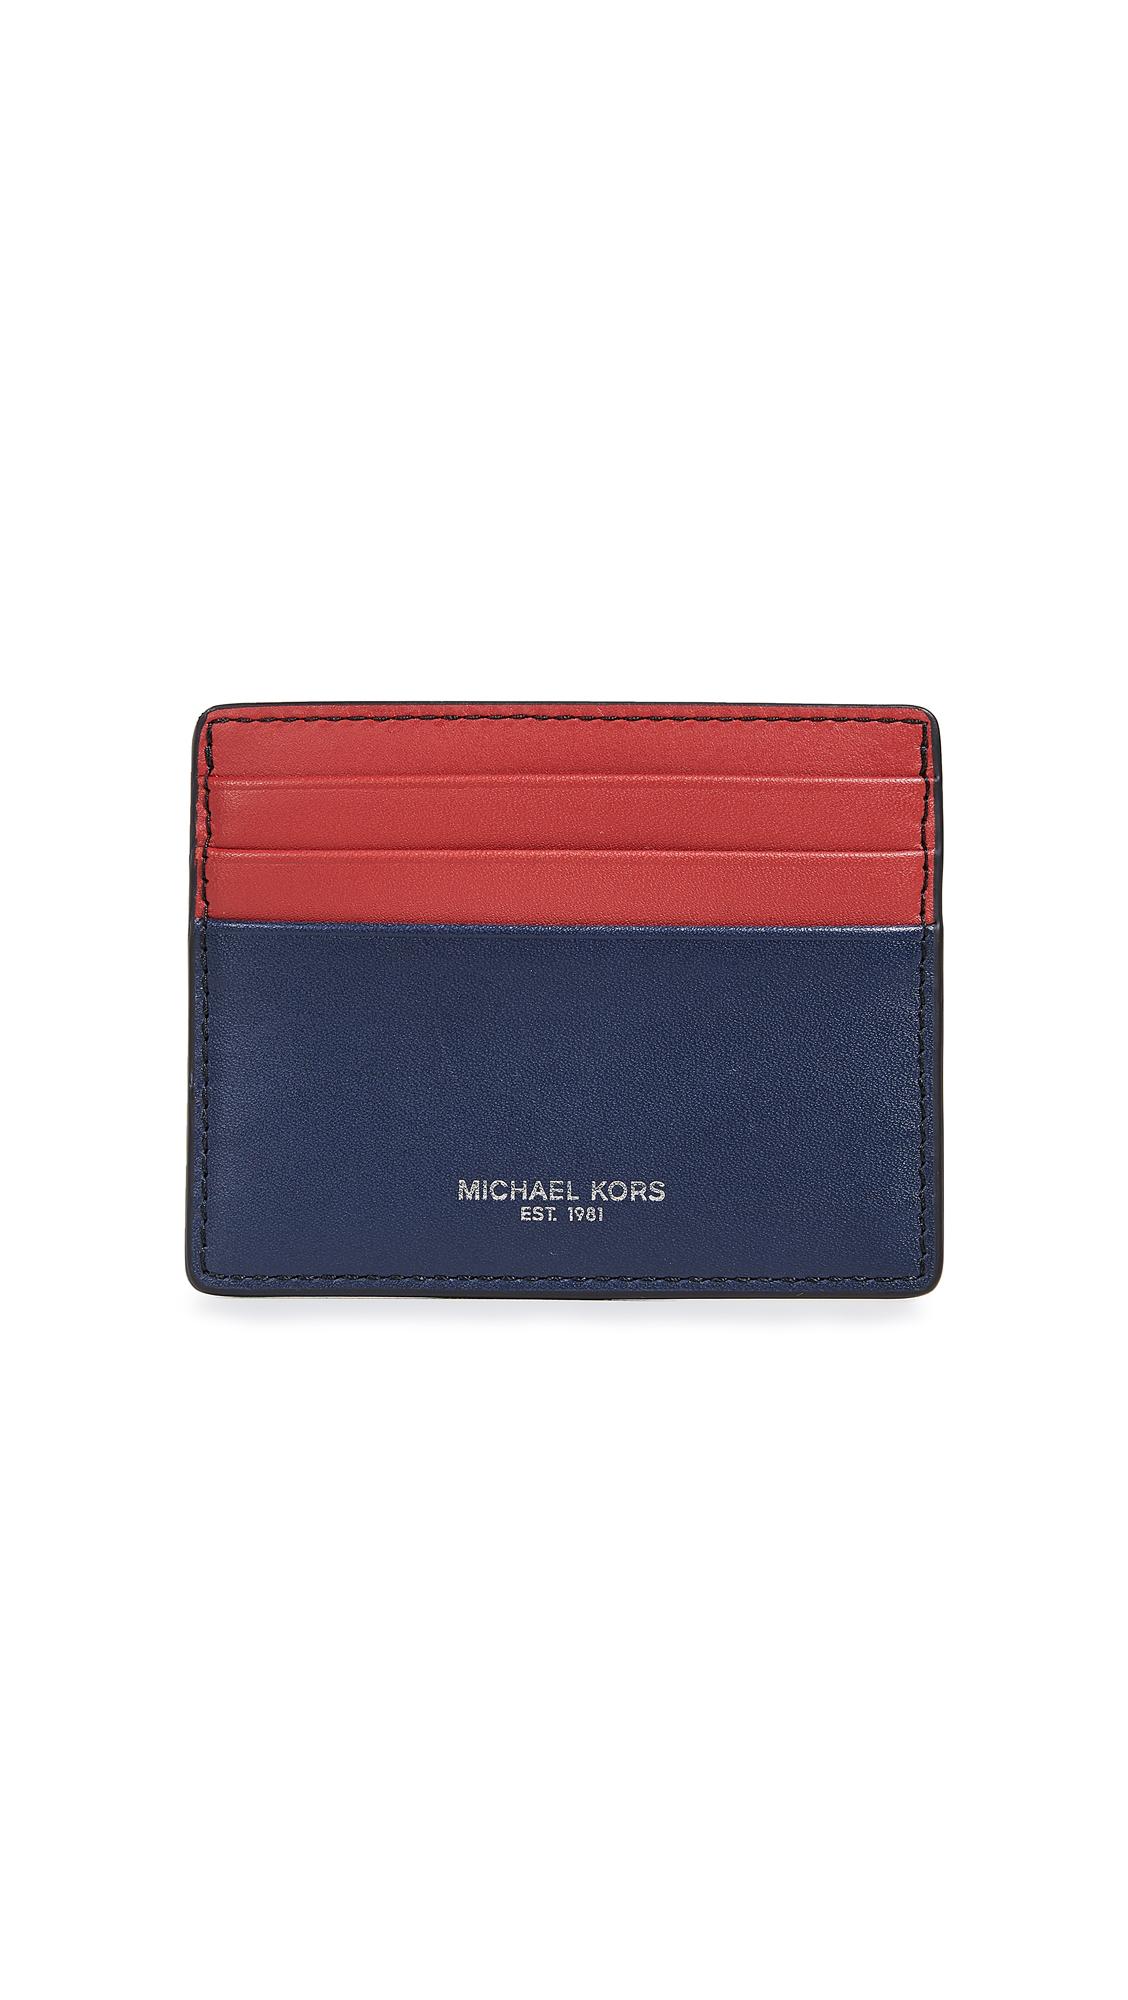 b17d3e3f48d277 Michael Kors Henry Tall Card Case In Navy/Crimson | ModeSens